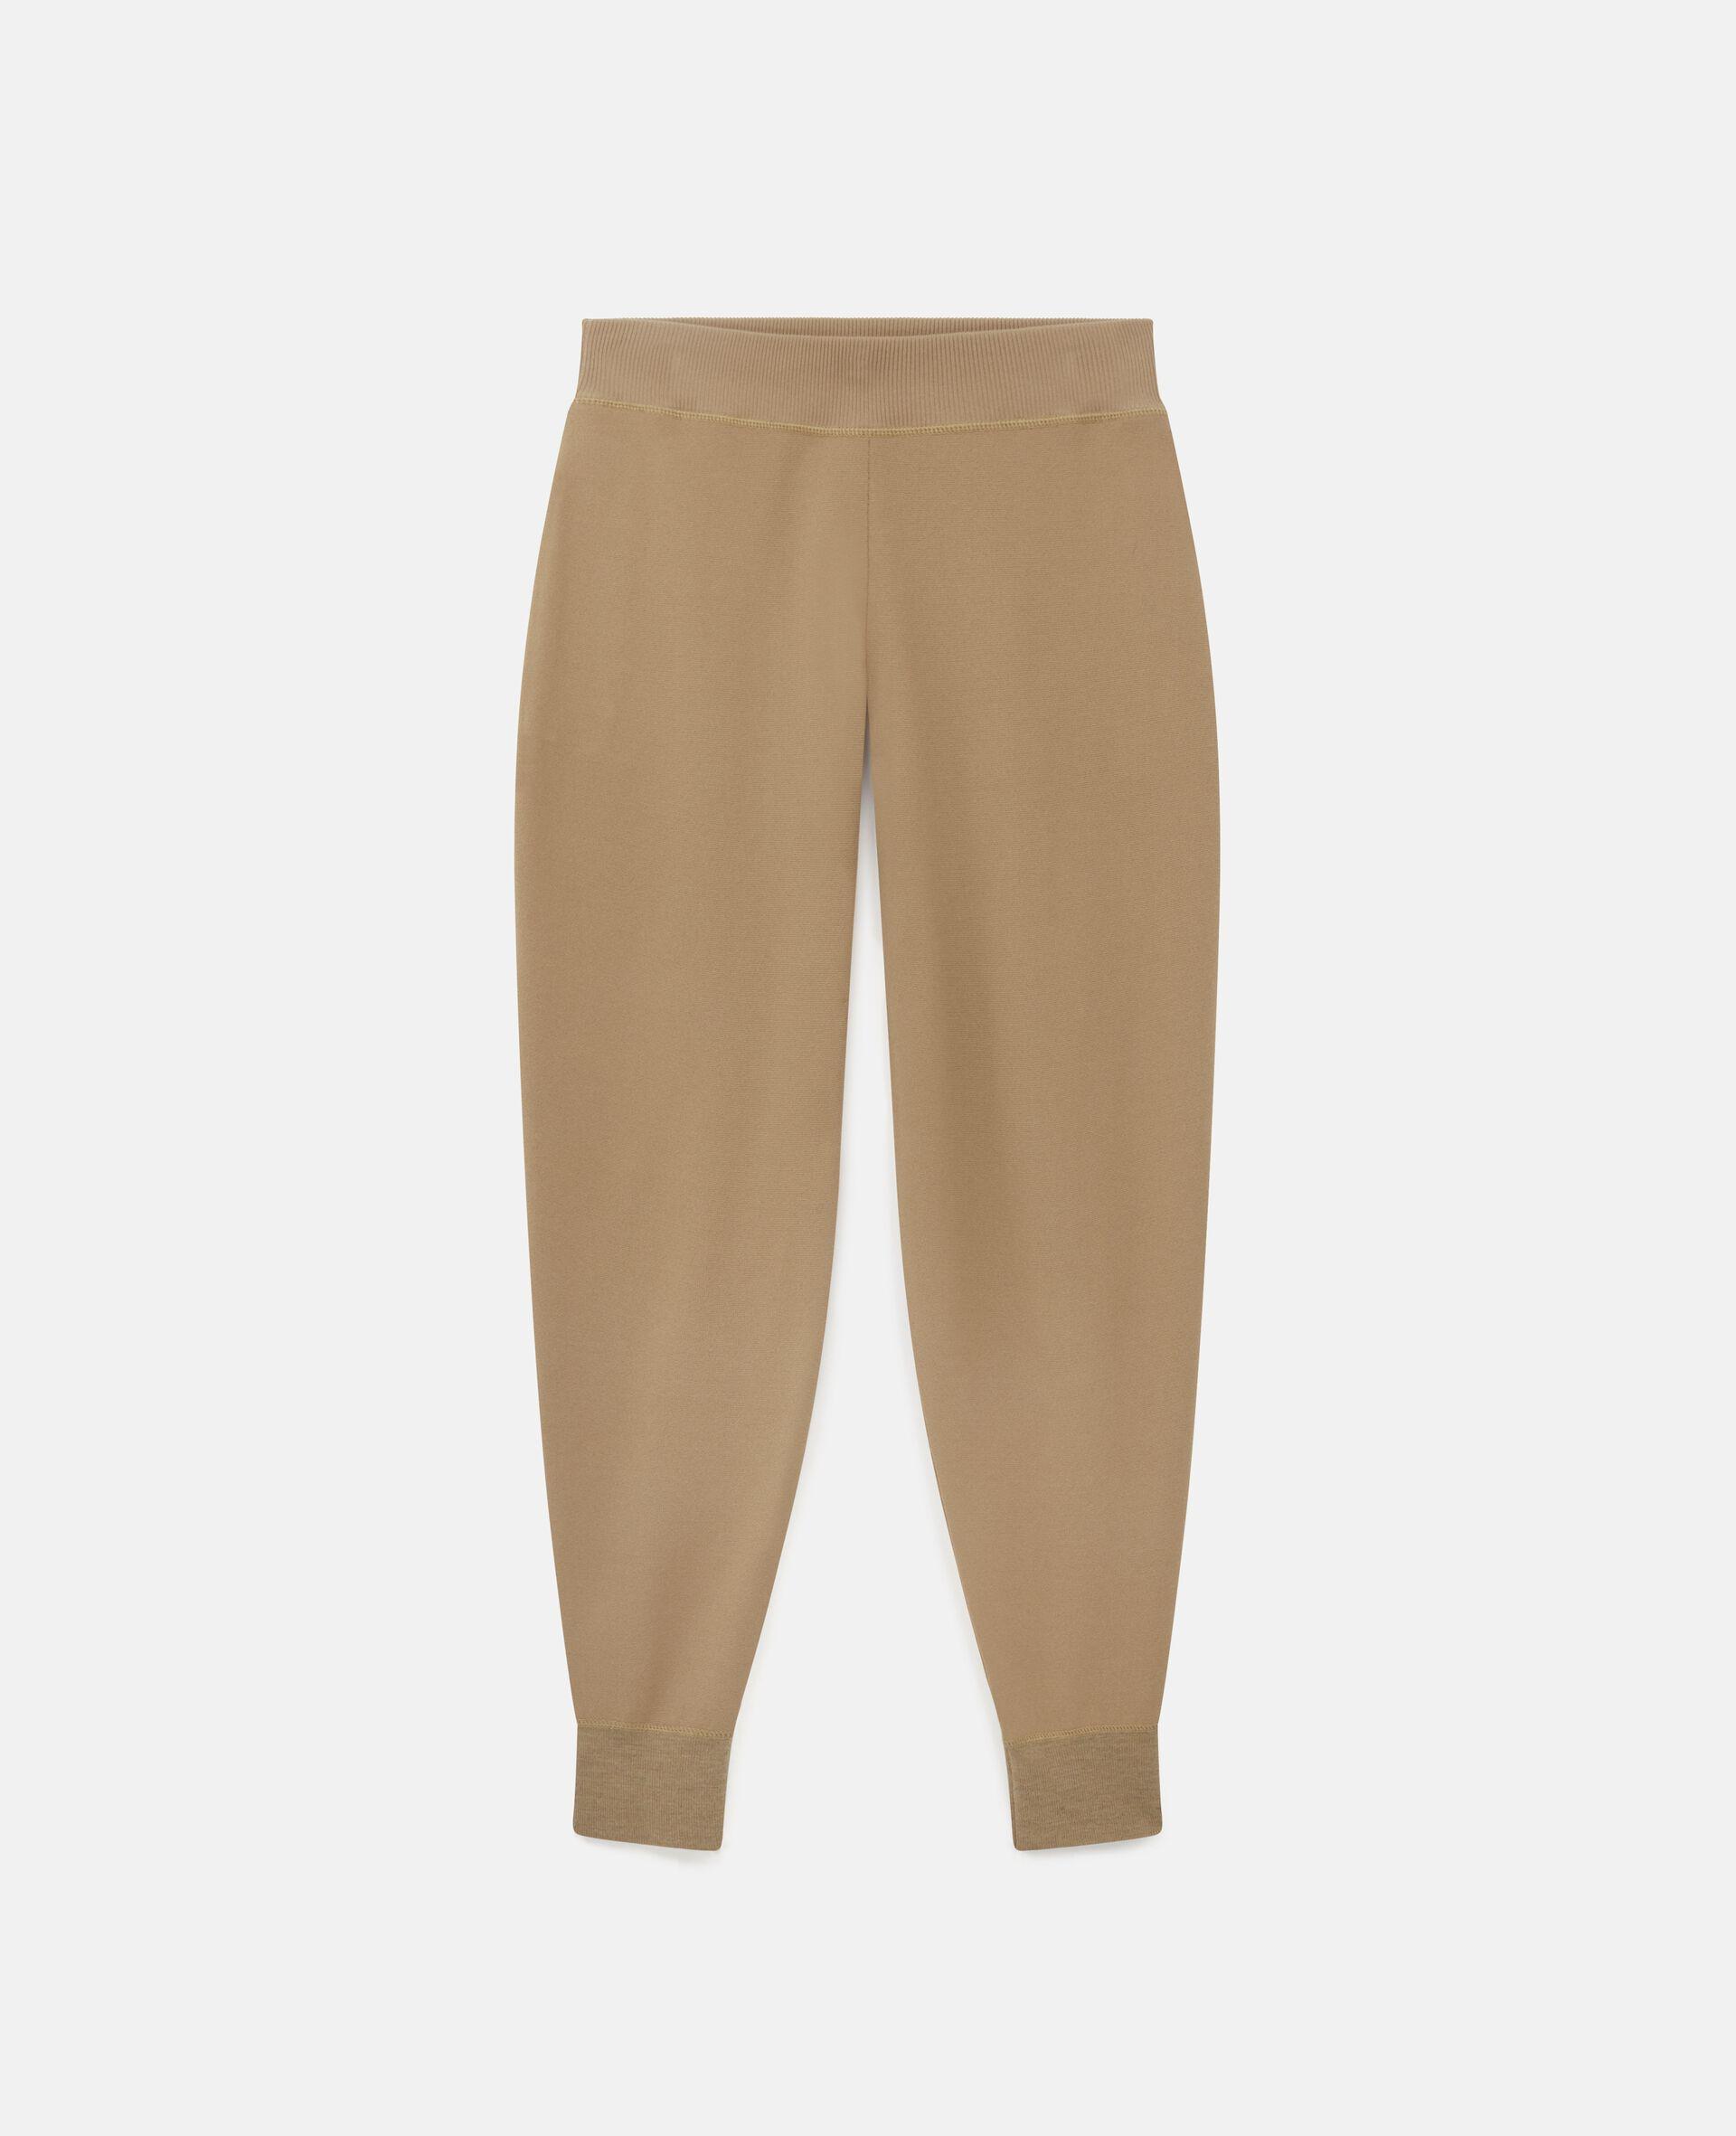 Pantaloni in Maglia Compatta-Marrone-large image number 0